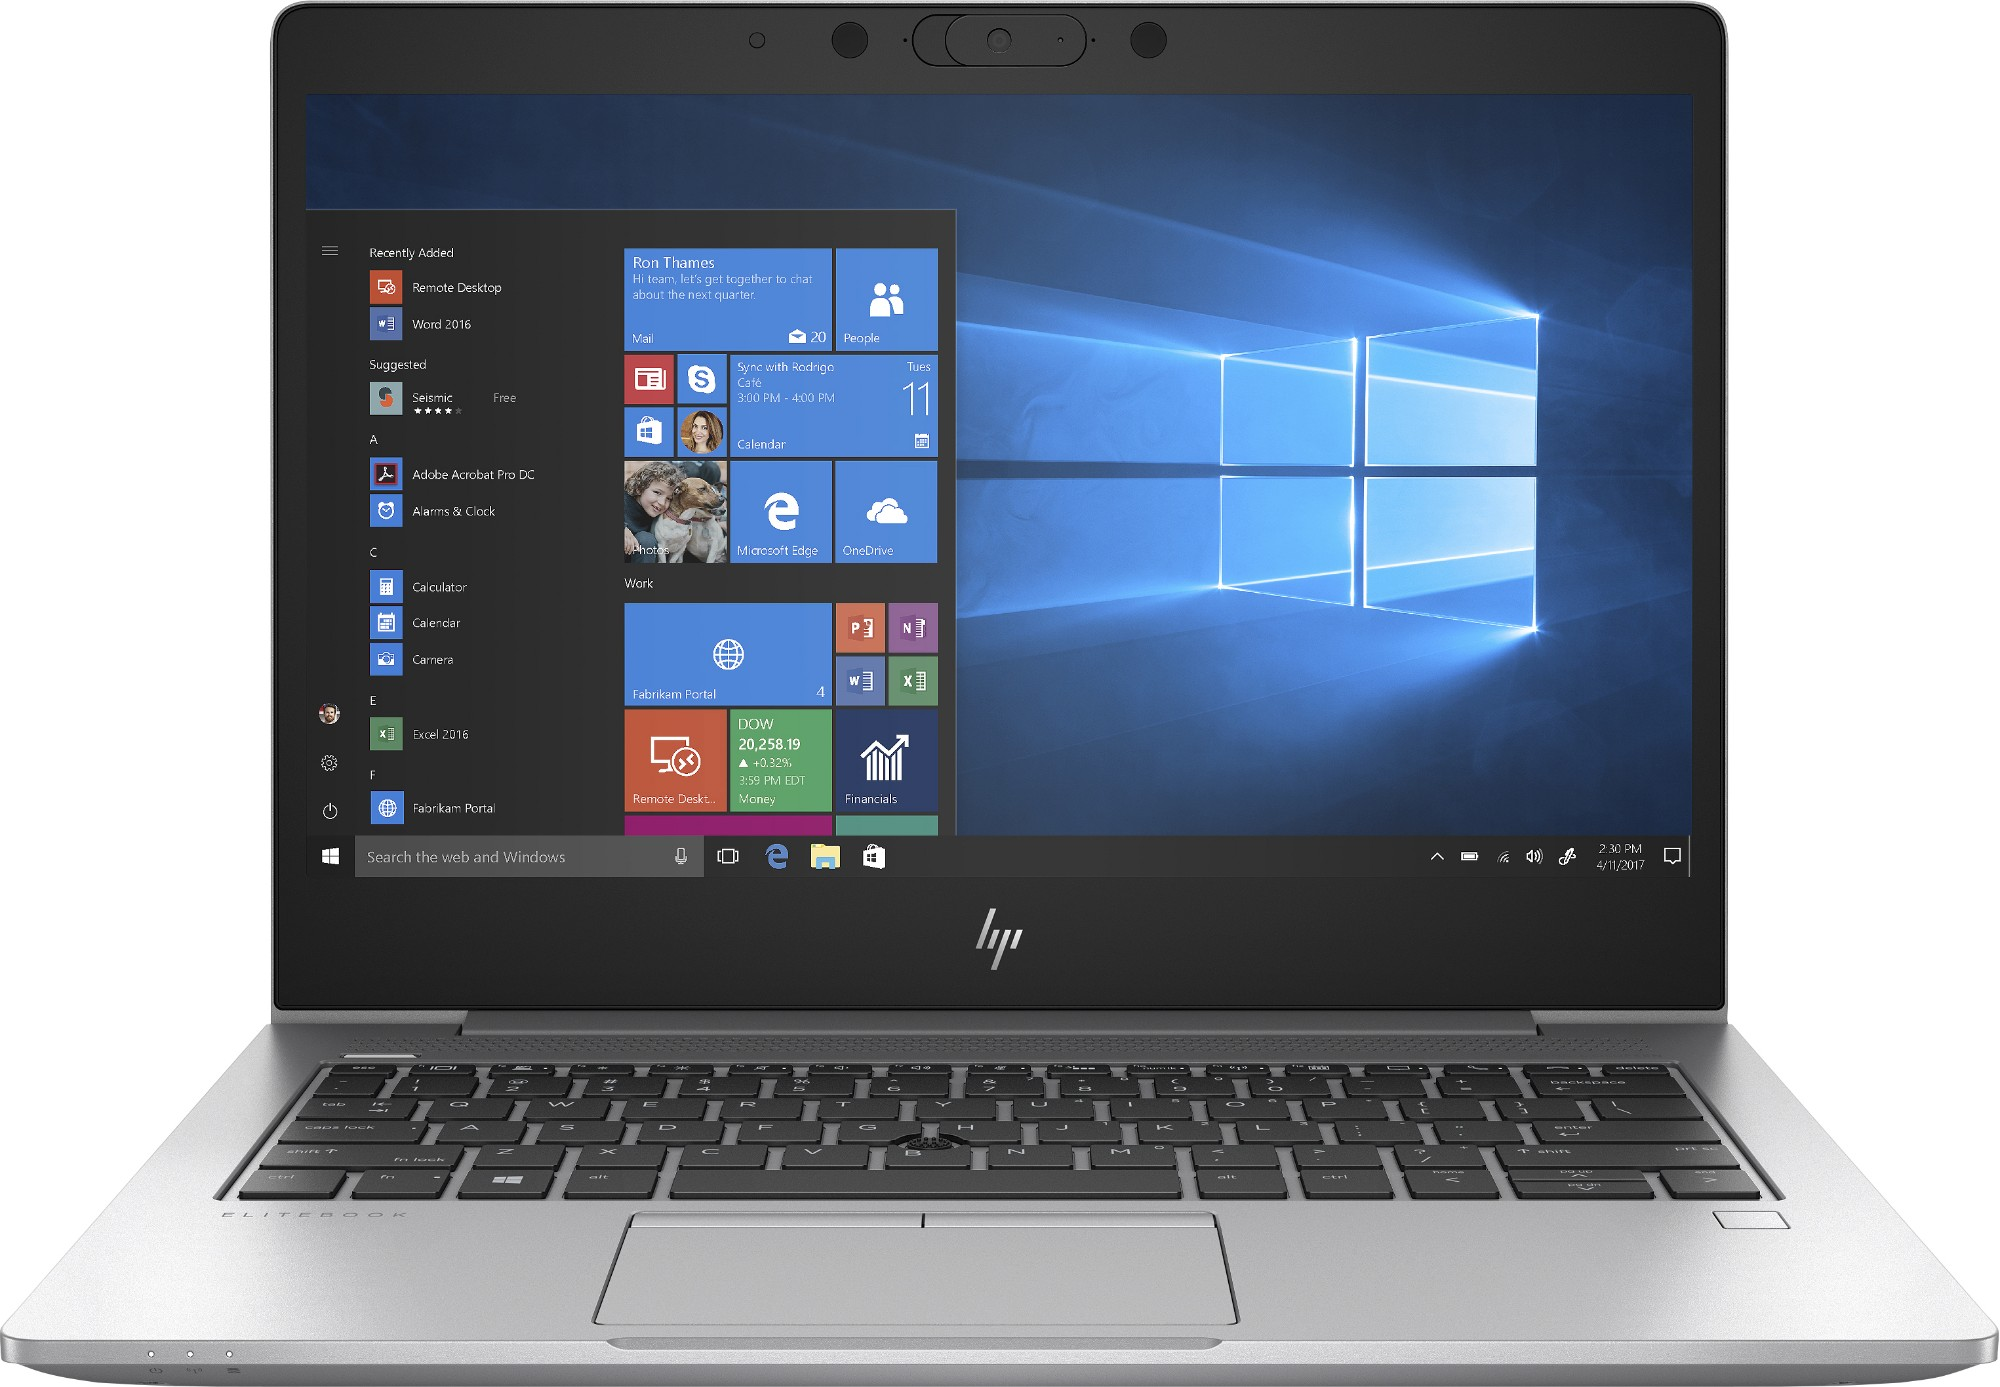 "HP EliteBook 735 G6 Portátil Plata 33,8 cm (13.3"") 1920 x 1080 Pixeles AMD Ryzen 7 PRO 8 GB DDR4-SDRAM 256 GB SSD Wi-Fi 6 (802.11ax) Windows 10 Pro"